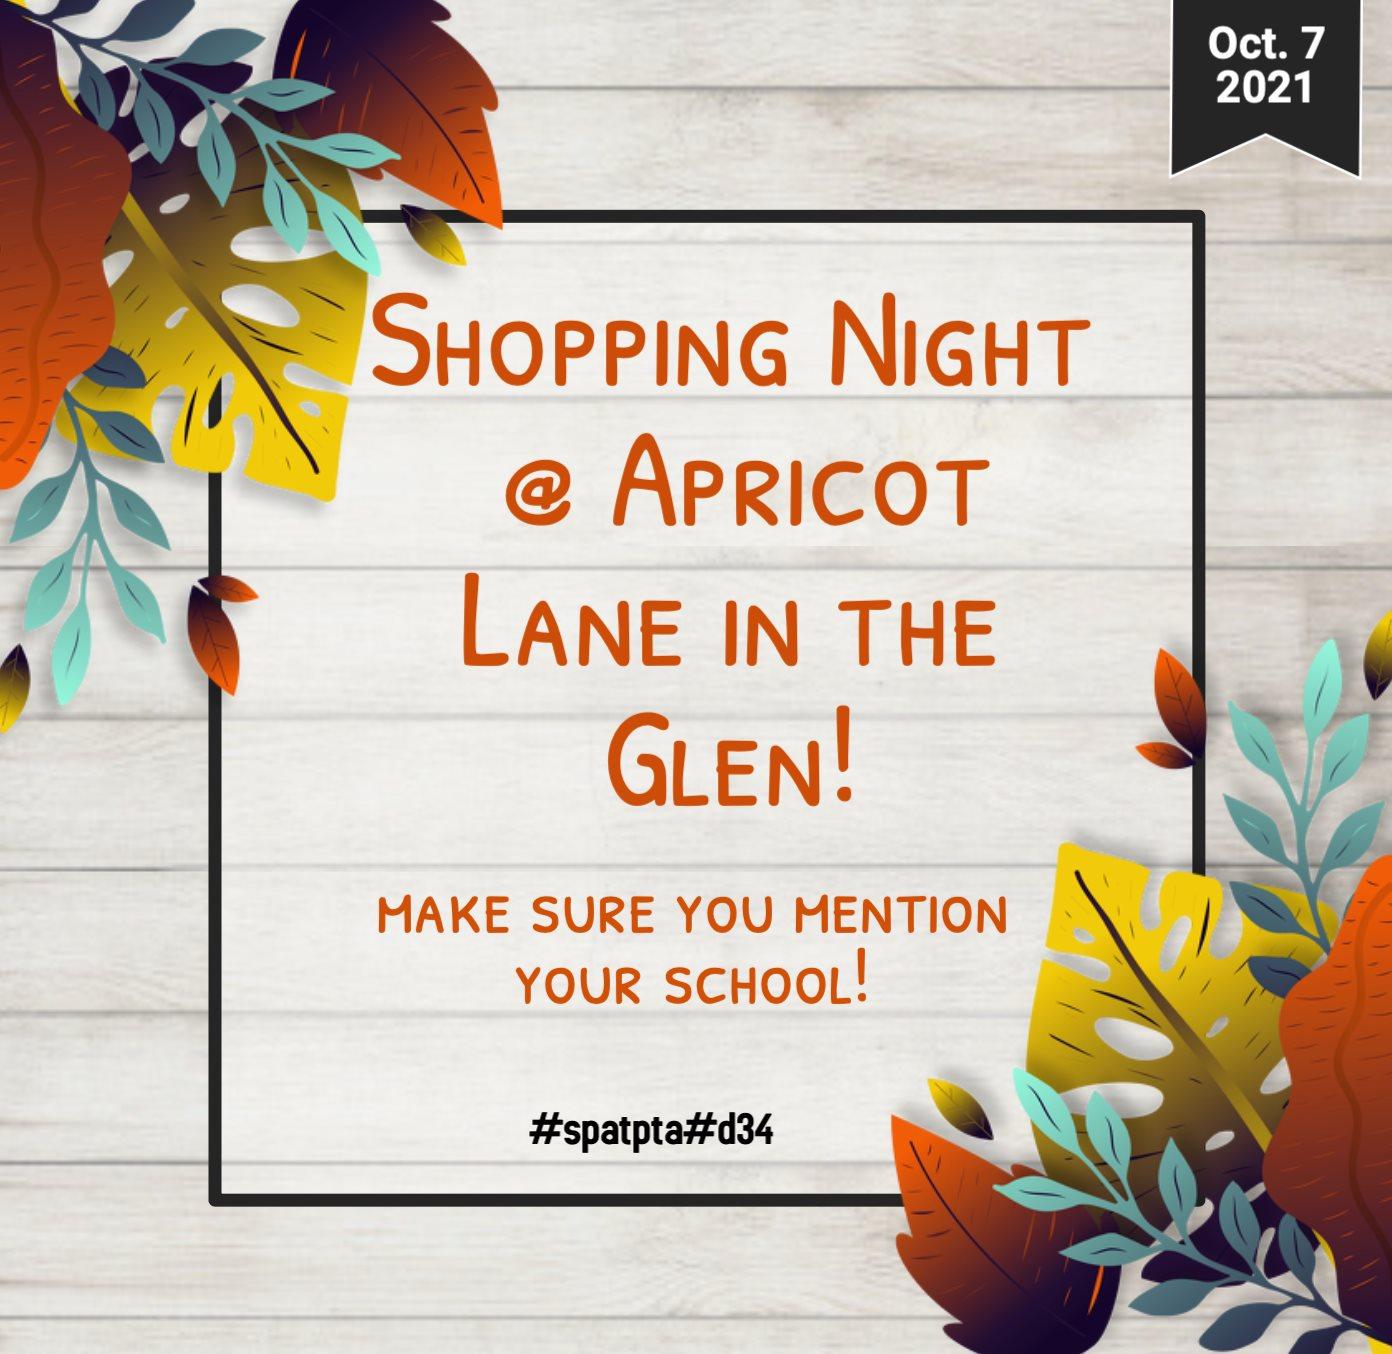 October 7, 2021 Shopping Night @apricot Lane in the Glen